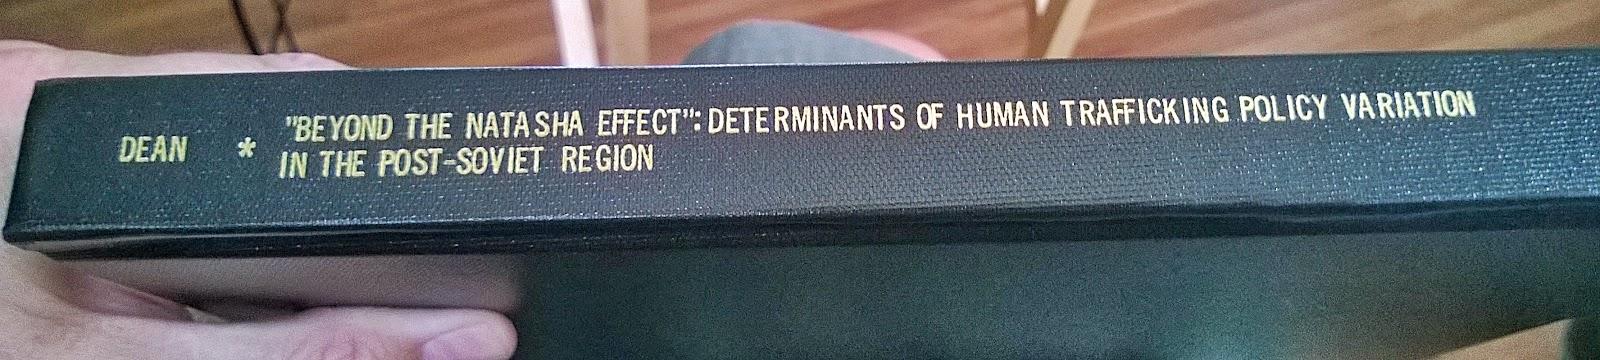 Copy Of Dissertation